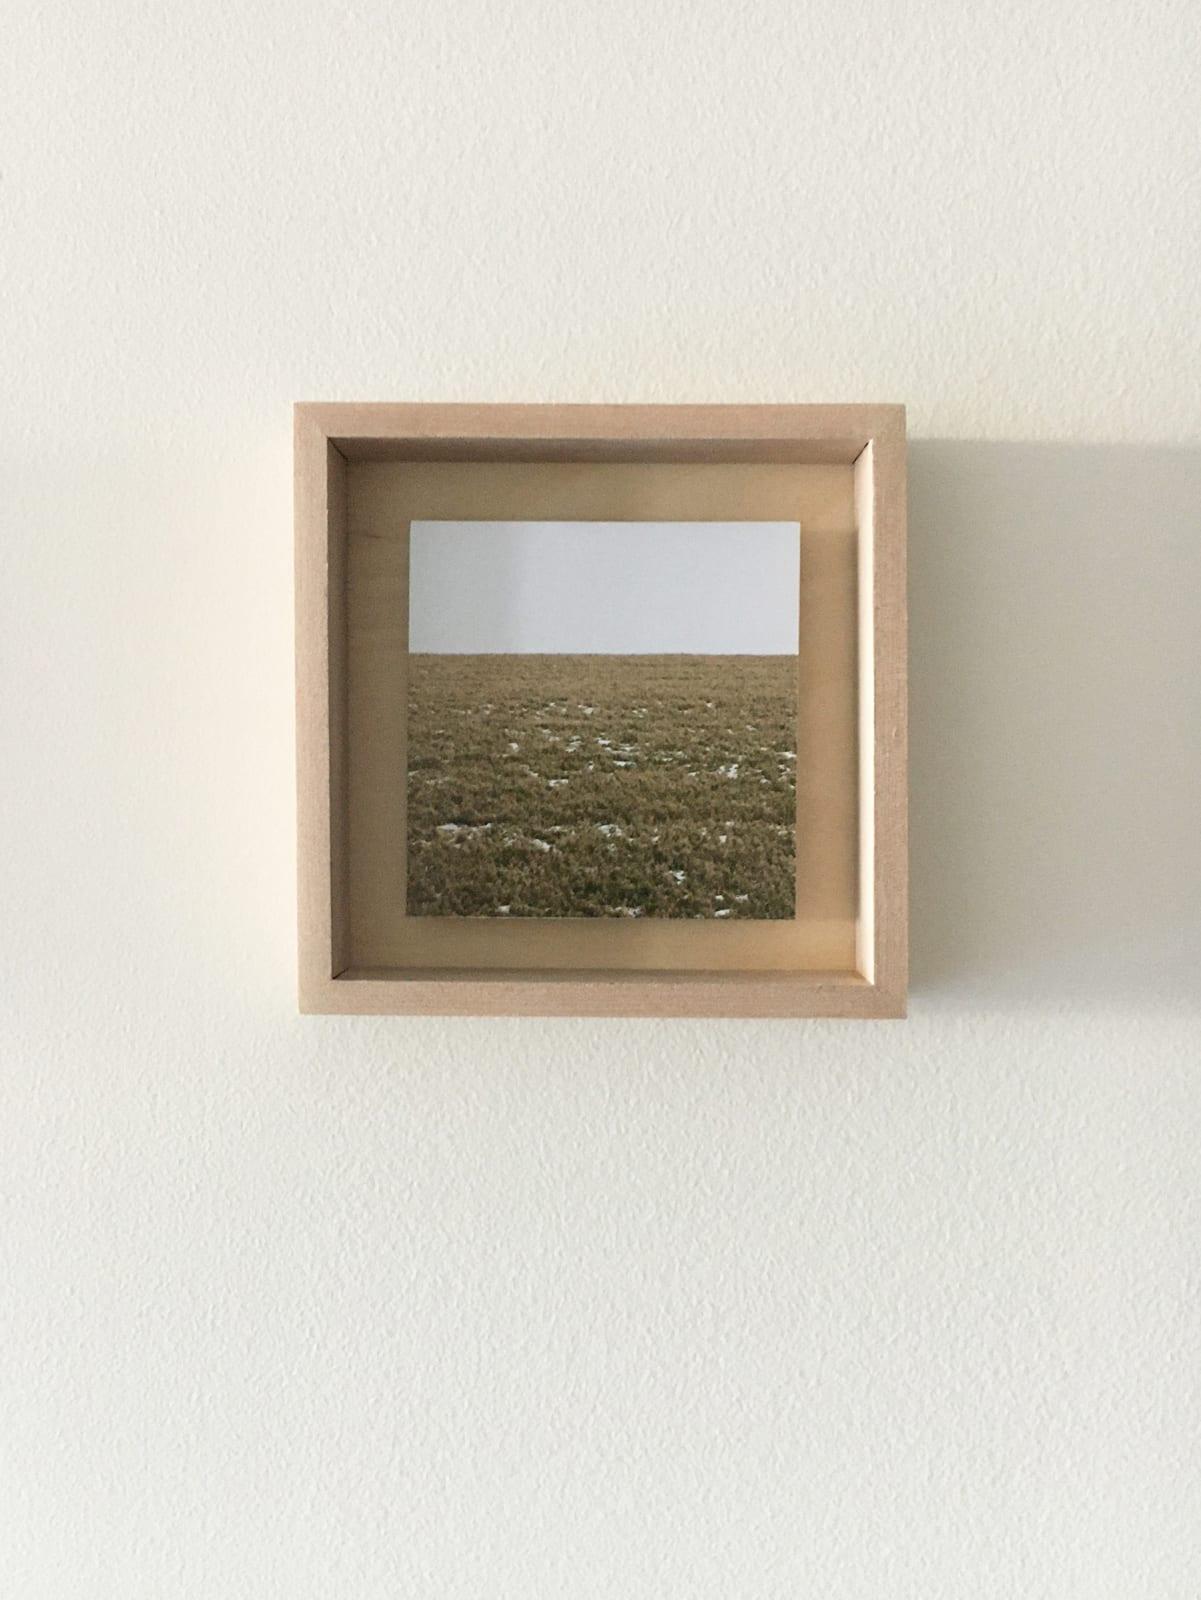 Grace Clark Sweet Fields IX, 2020 digital pigment print 6 x 6 inches, edition 1/3 $ 500.00